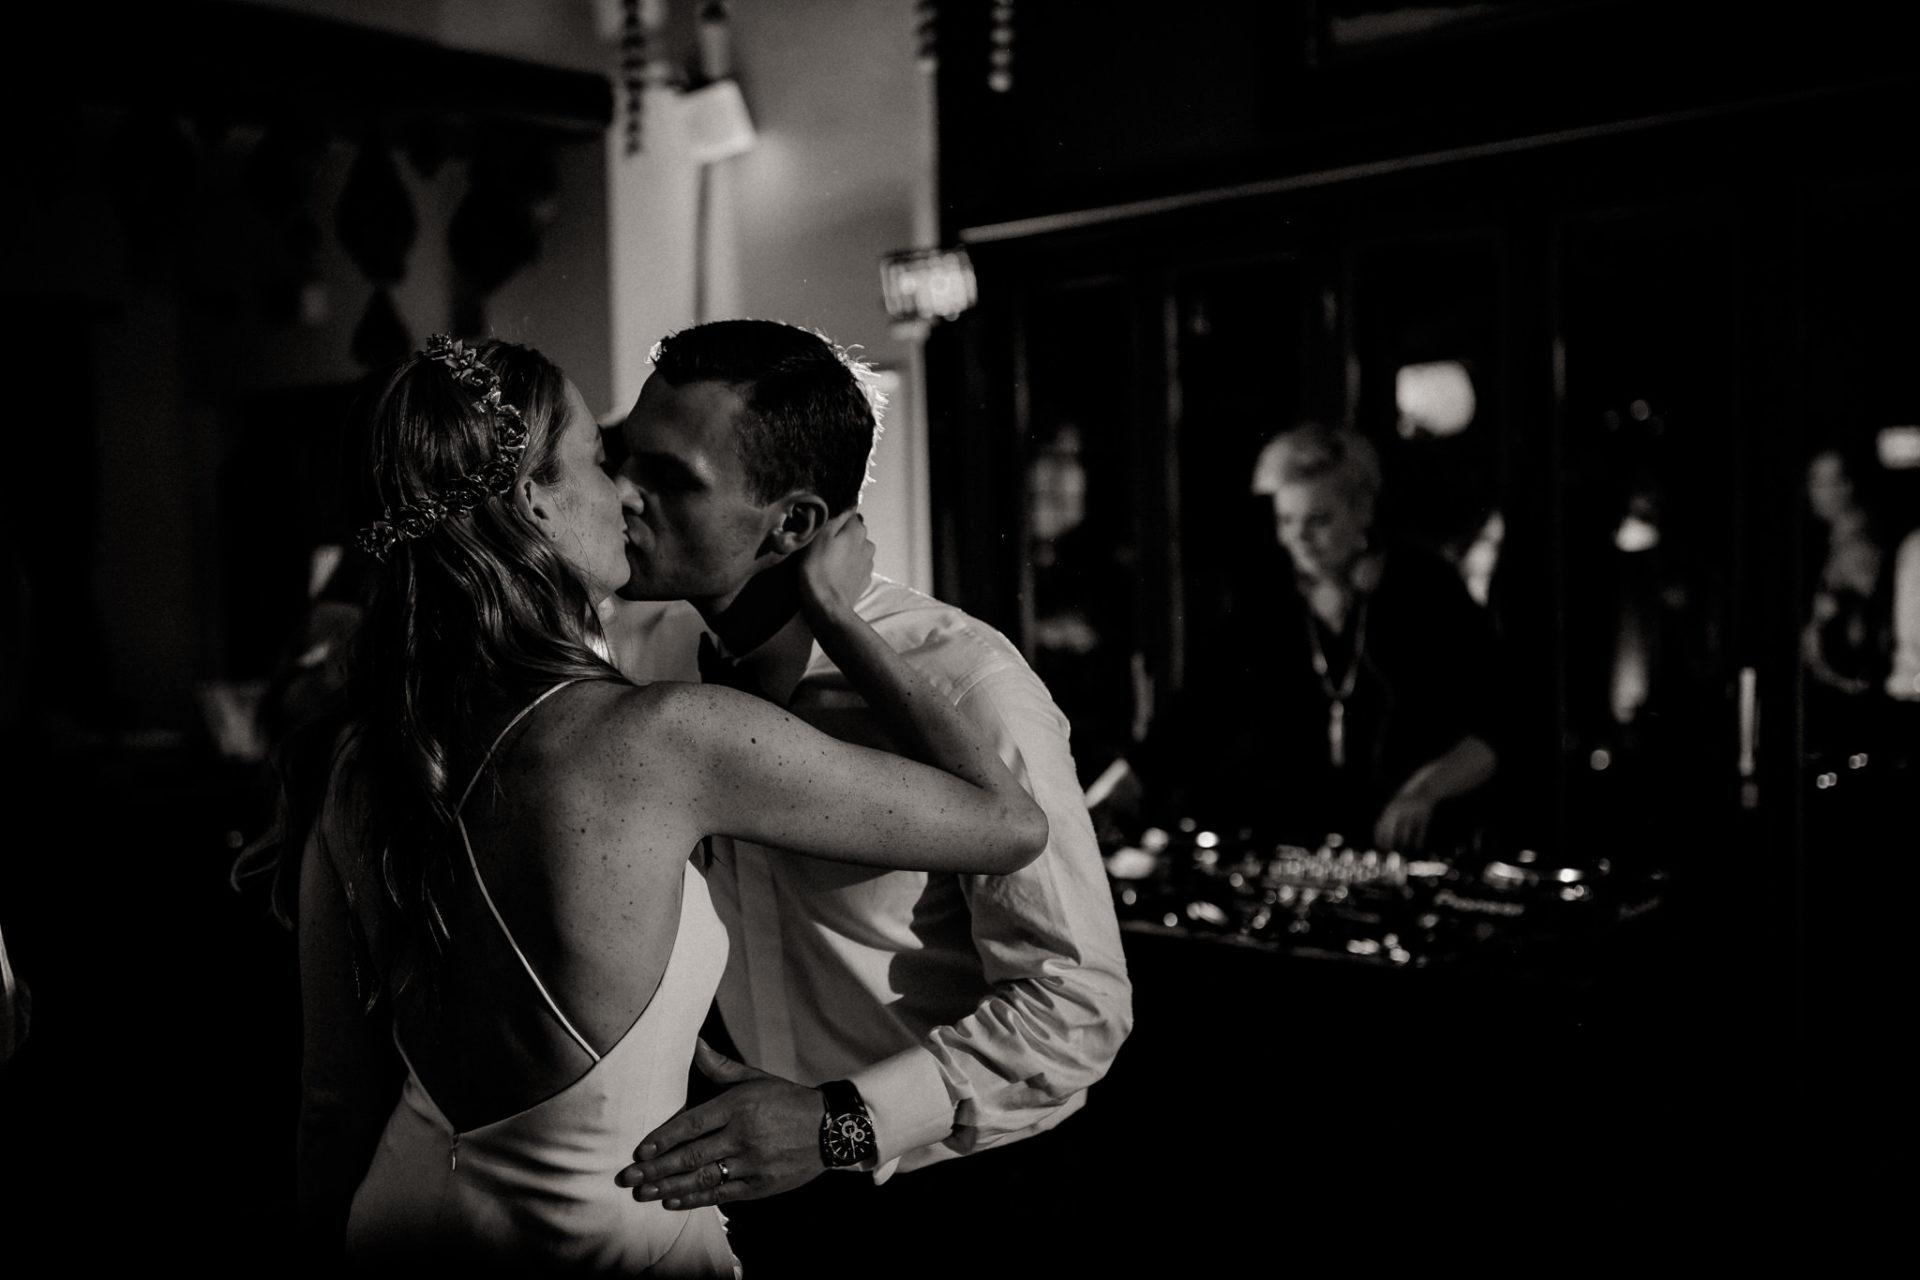 documentary candid emotional wedding photographer berlin-international german-american wedding-elegant wedding germany-destination wedding berlin-candid portraits-creative wedding